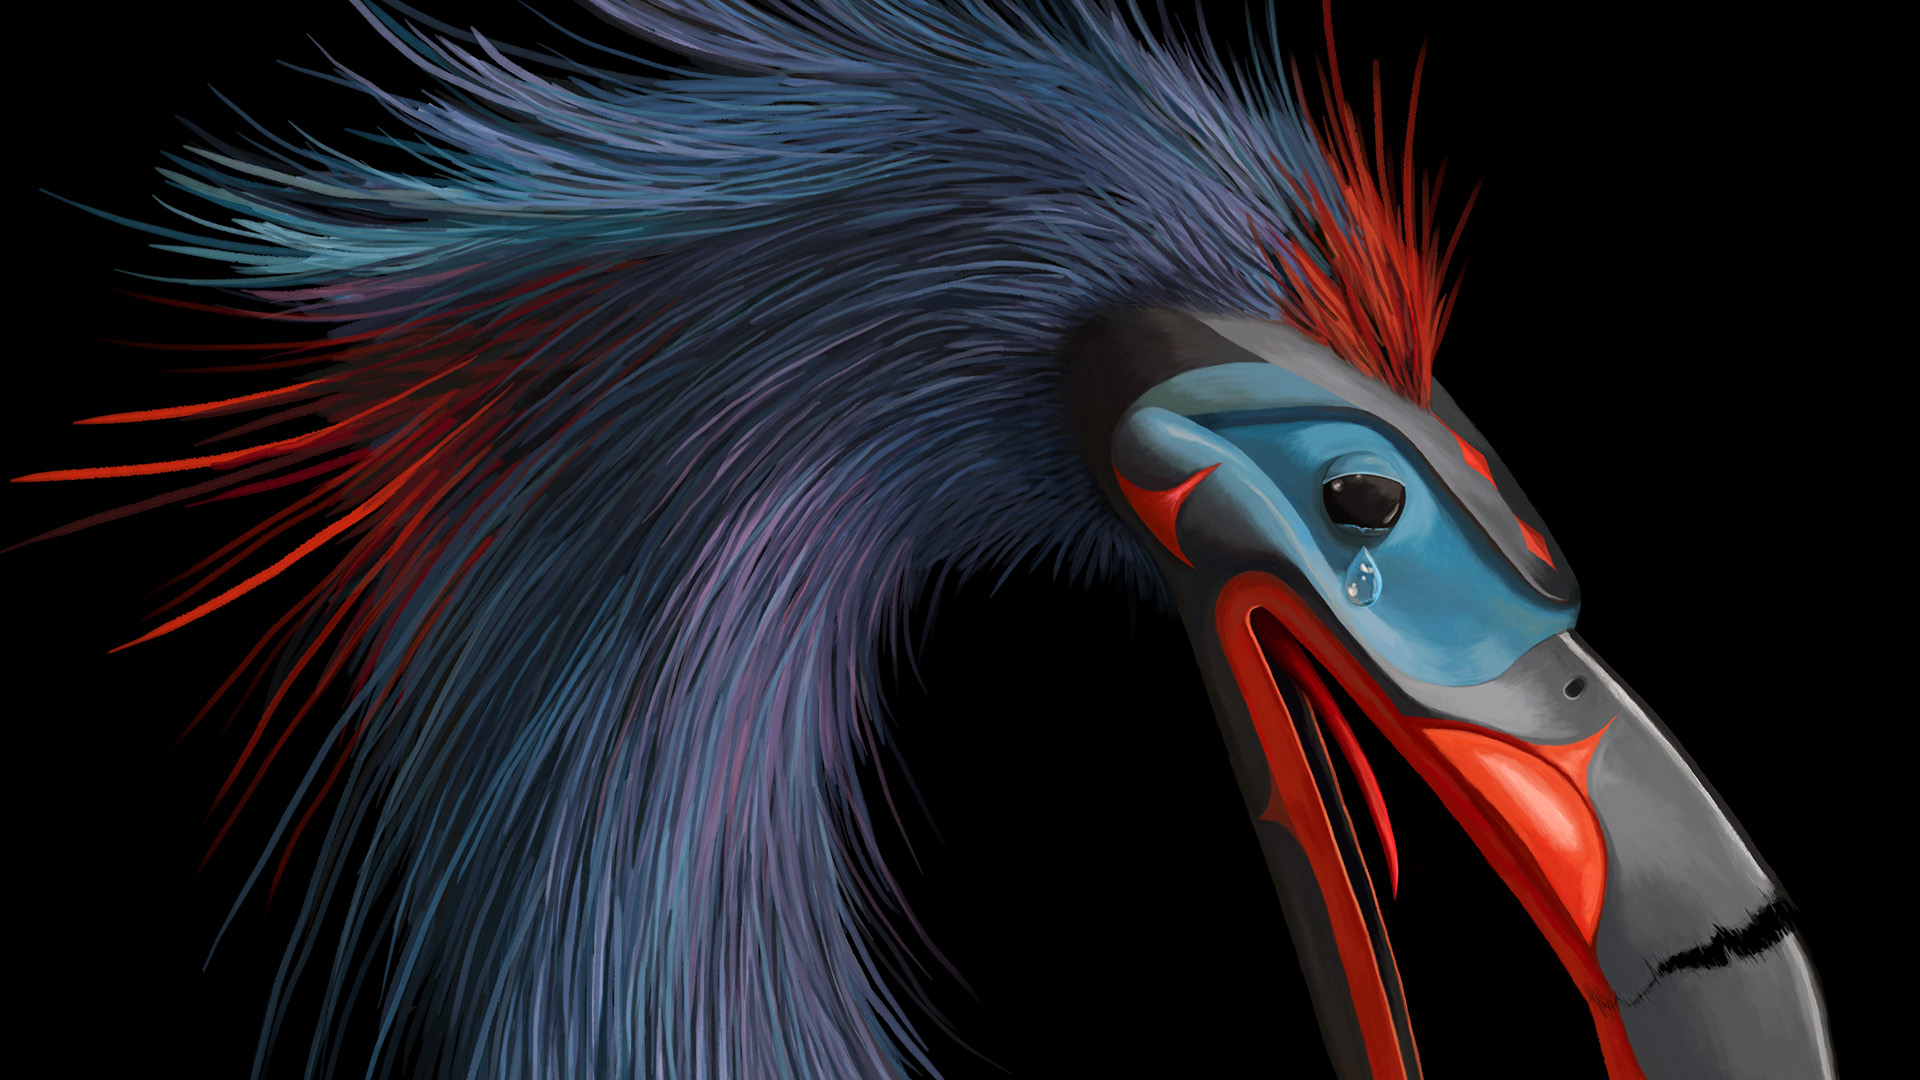 PICTOPLASMA T02 2015 THUNDERBIRD yves